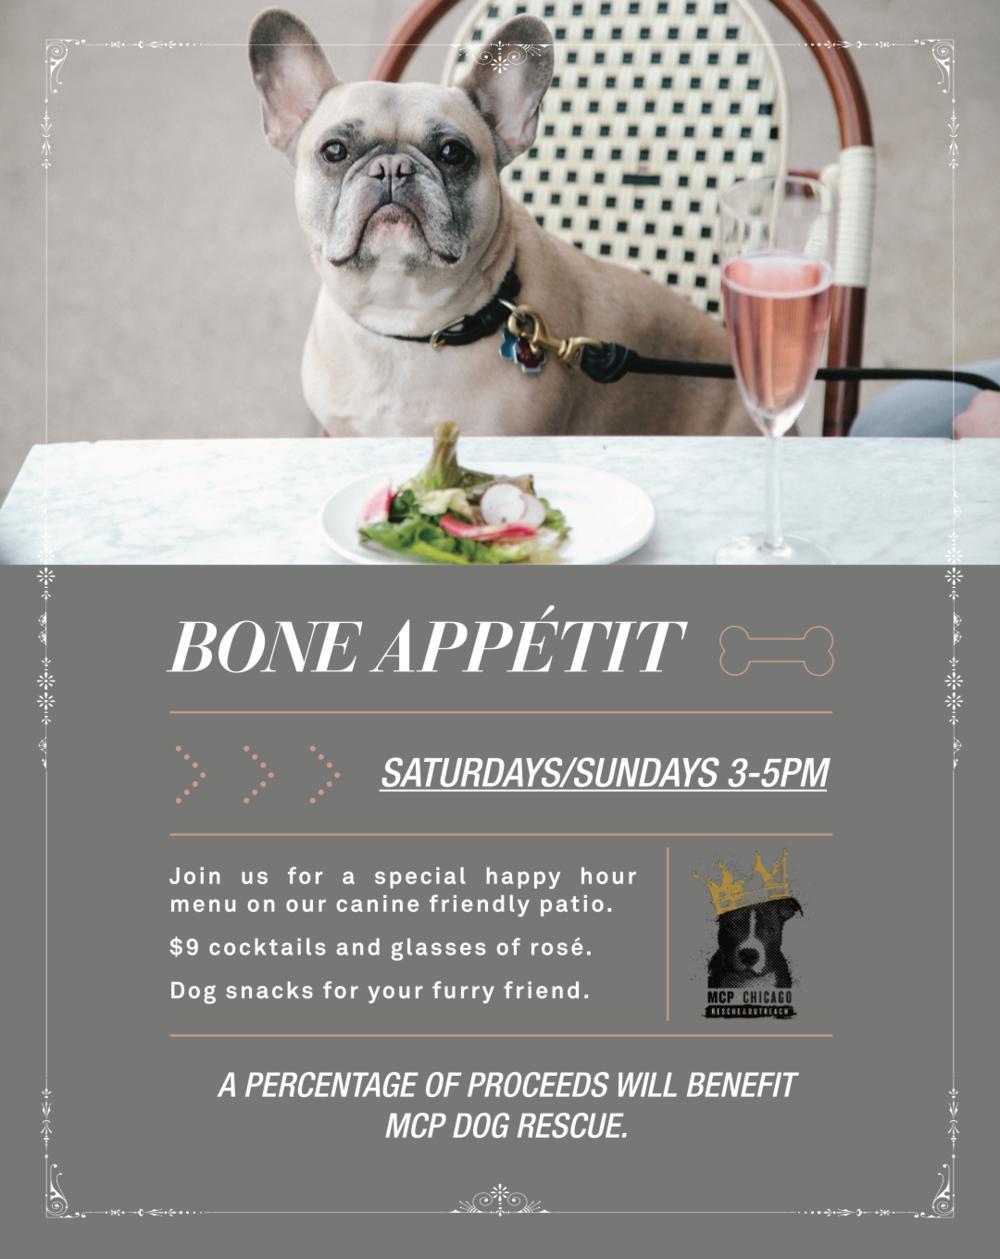 nellcote_bone_appetit